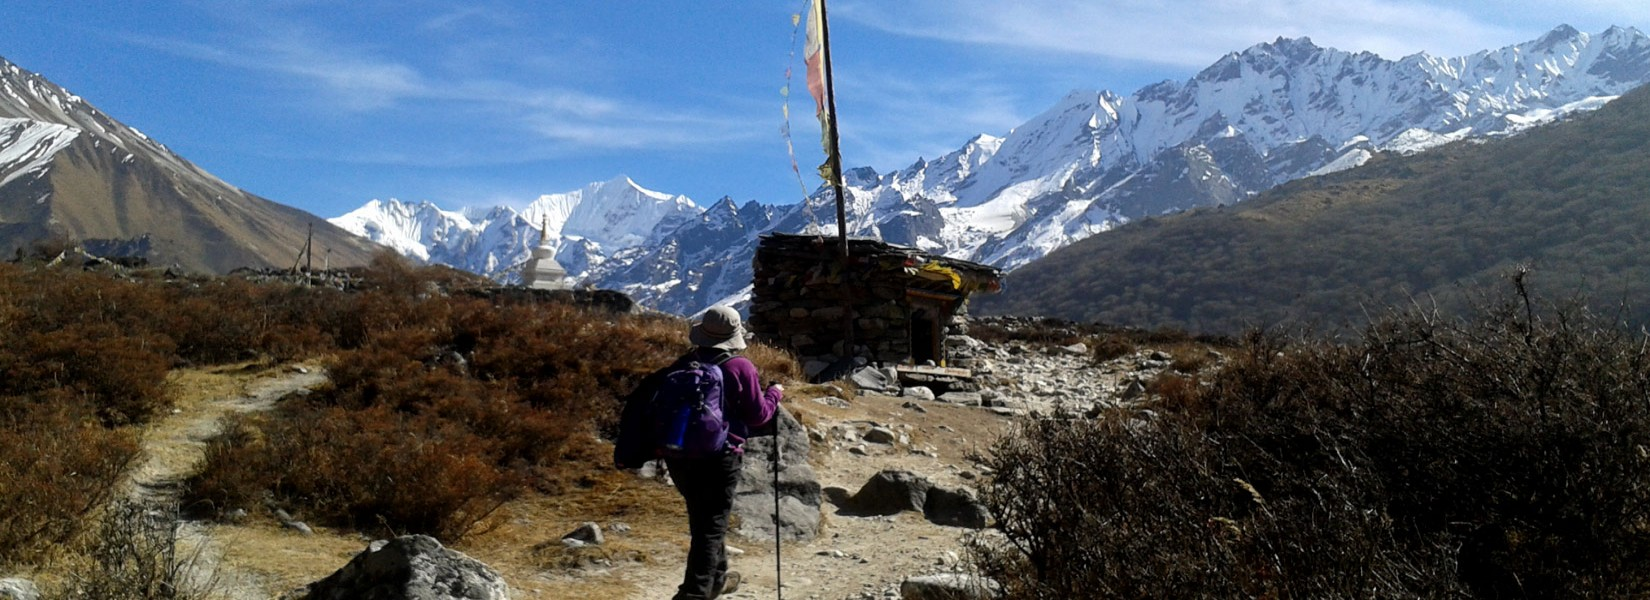 Langtang Valley Trek Photo